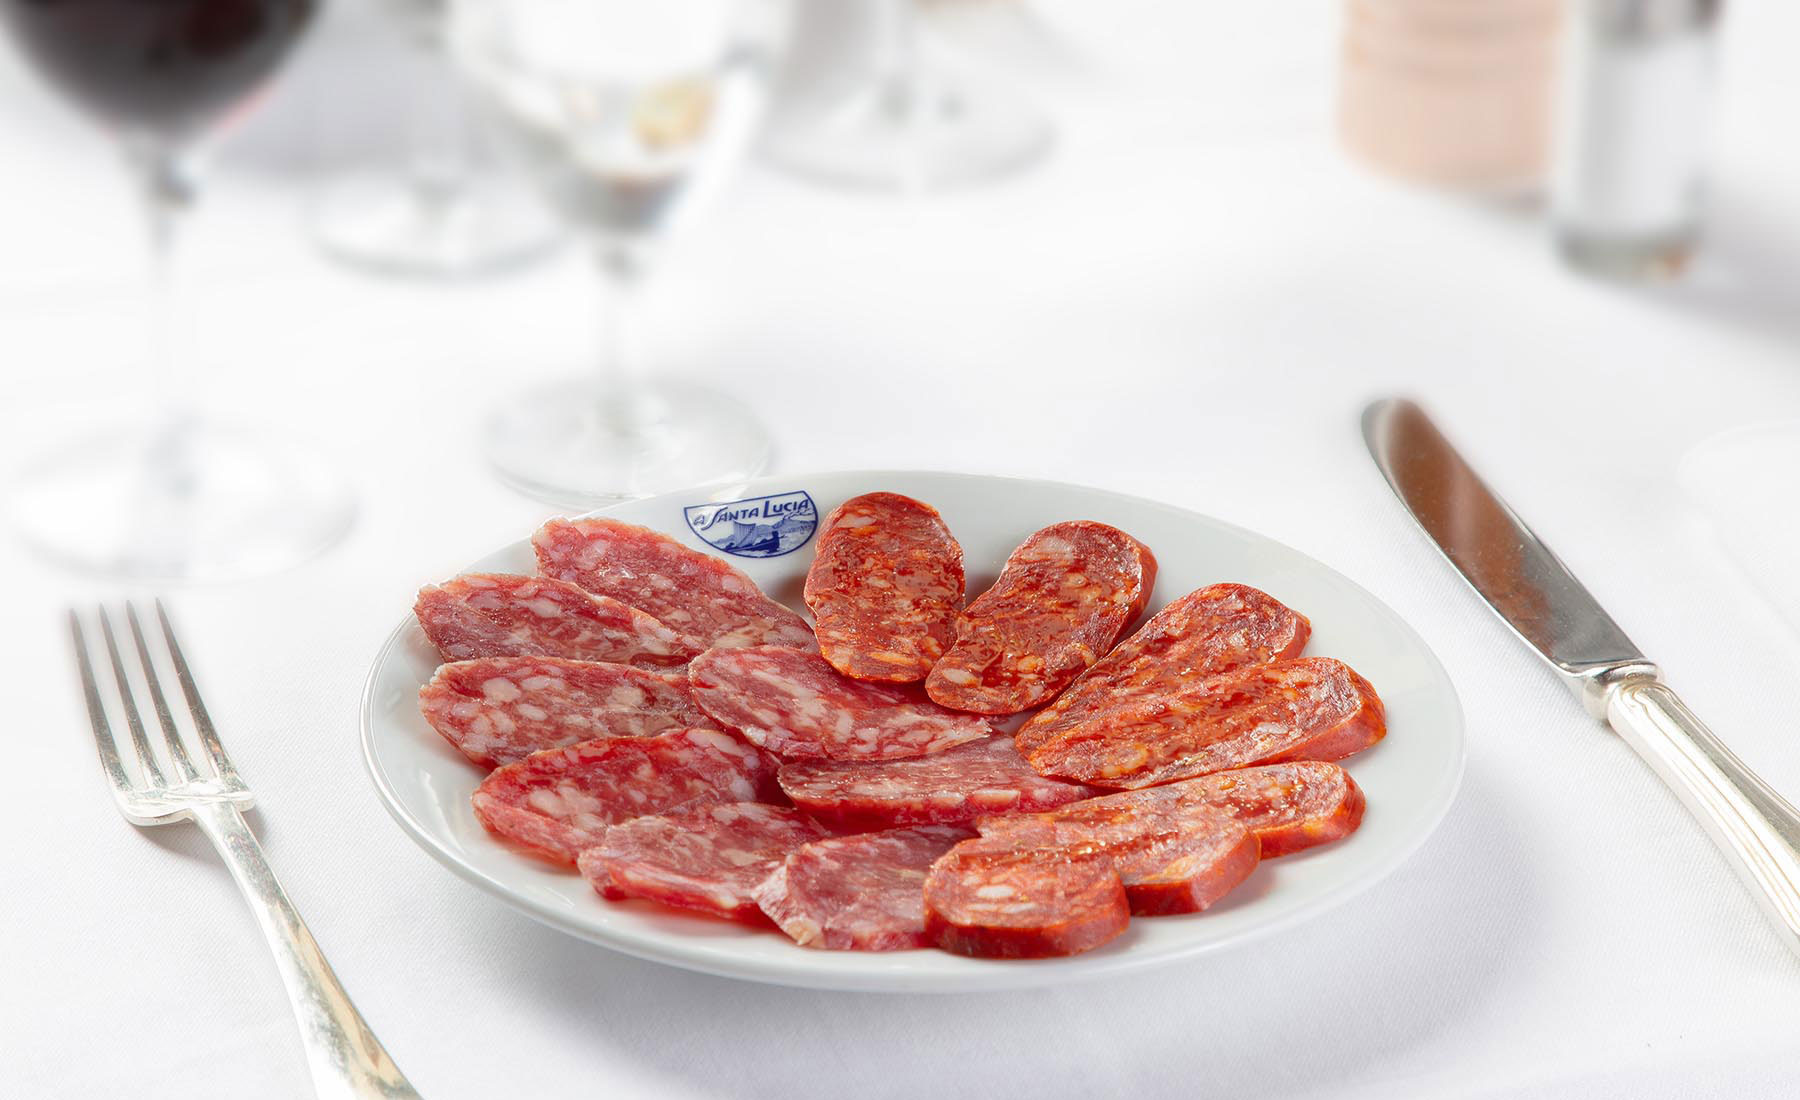 Salame di Felino e salsiccia Napoletana